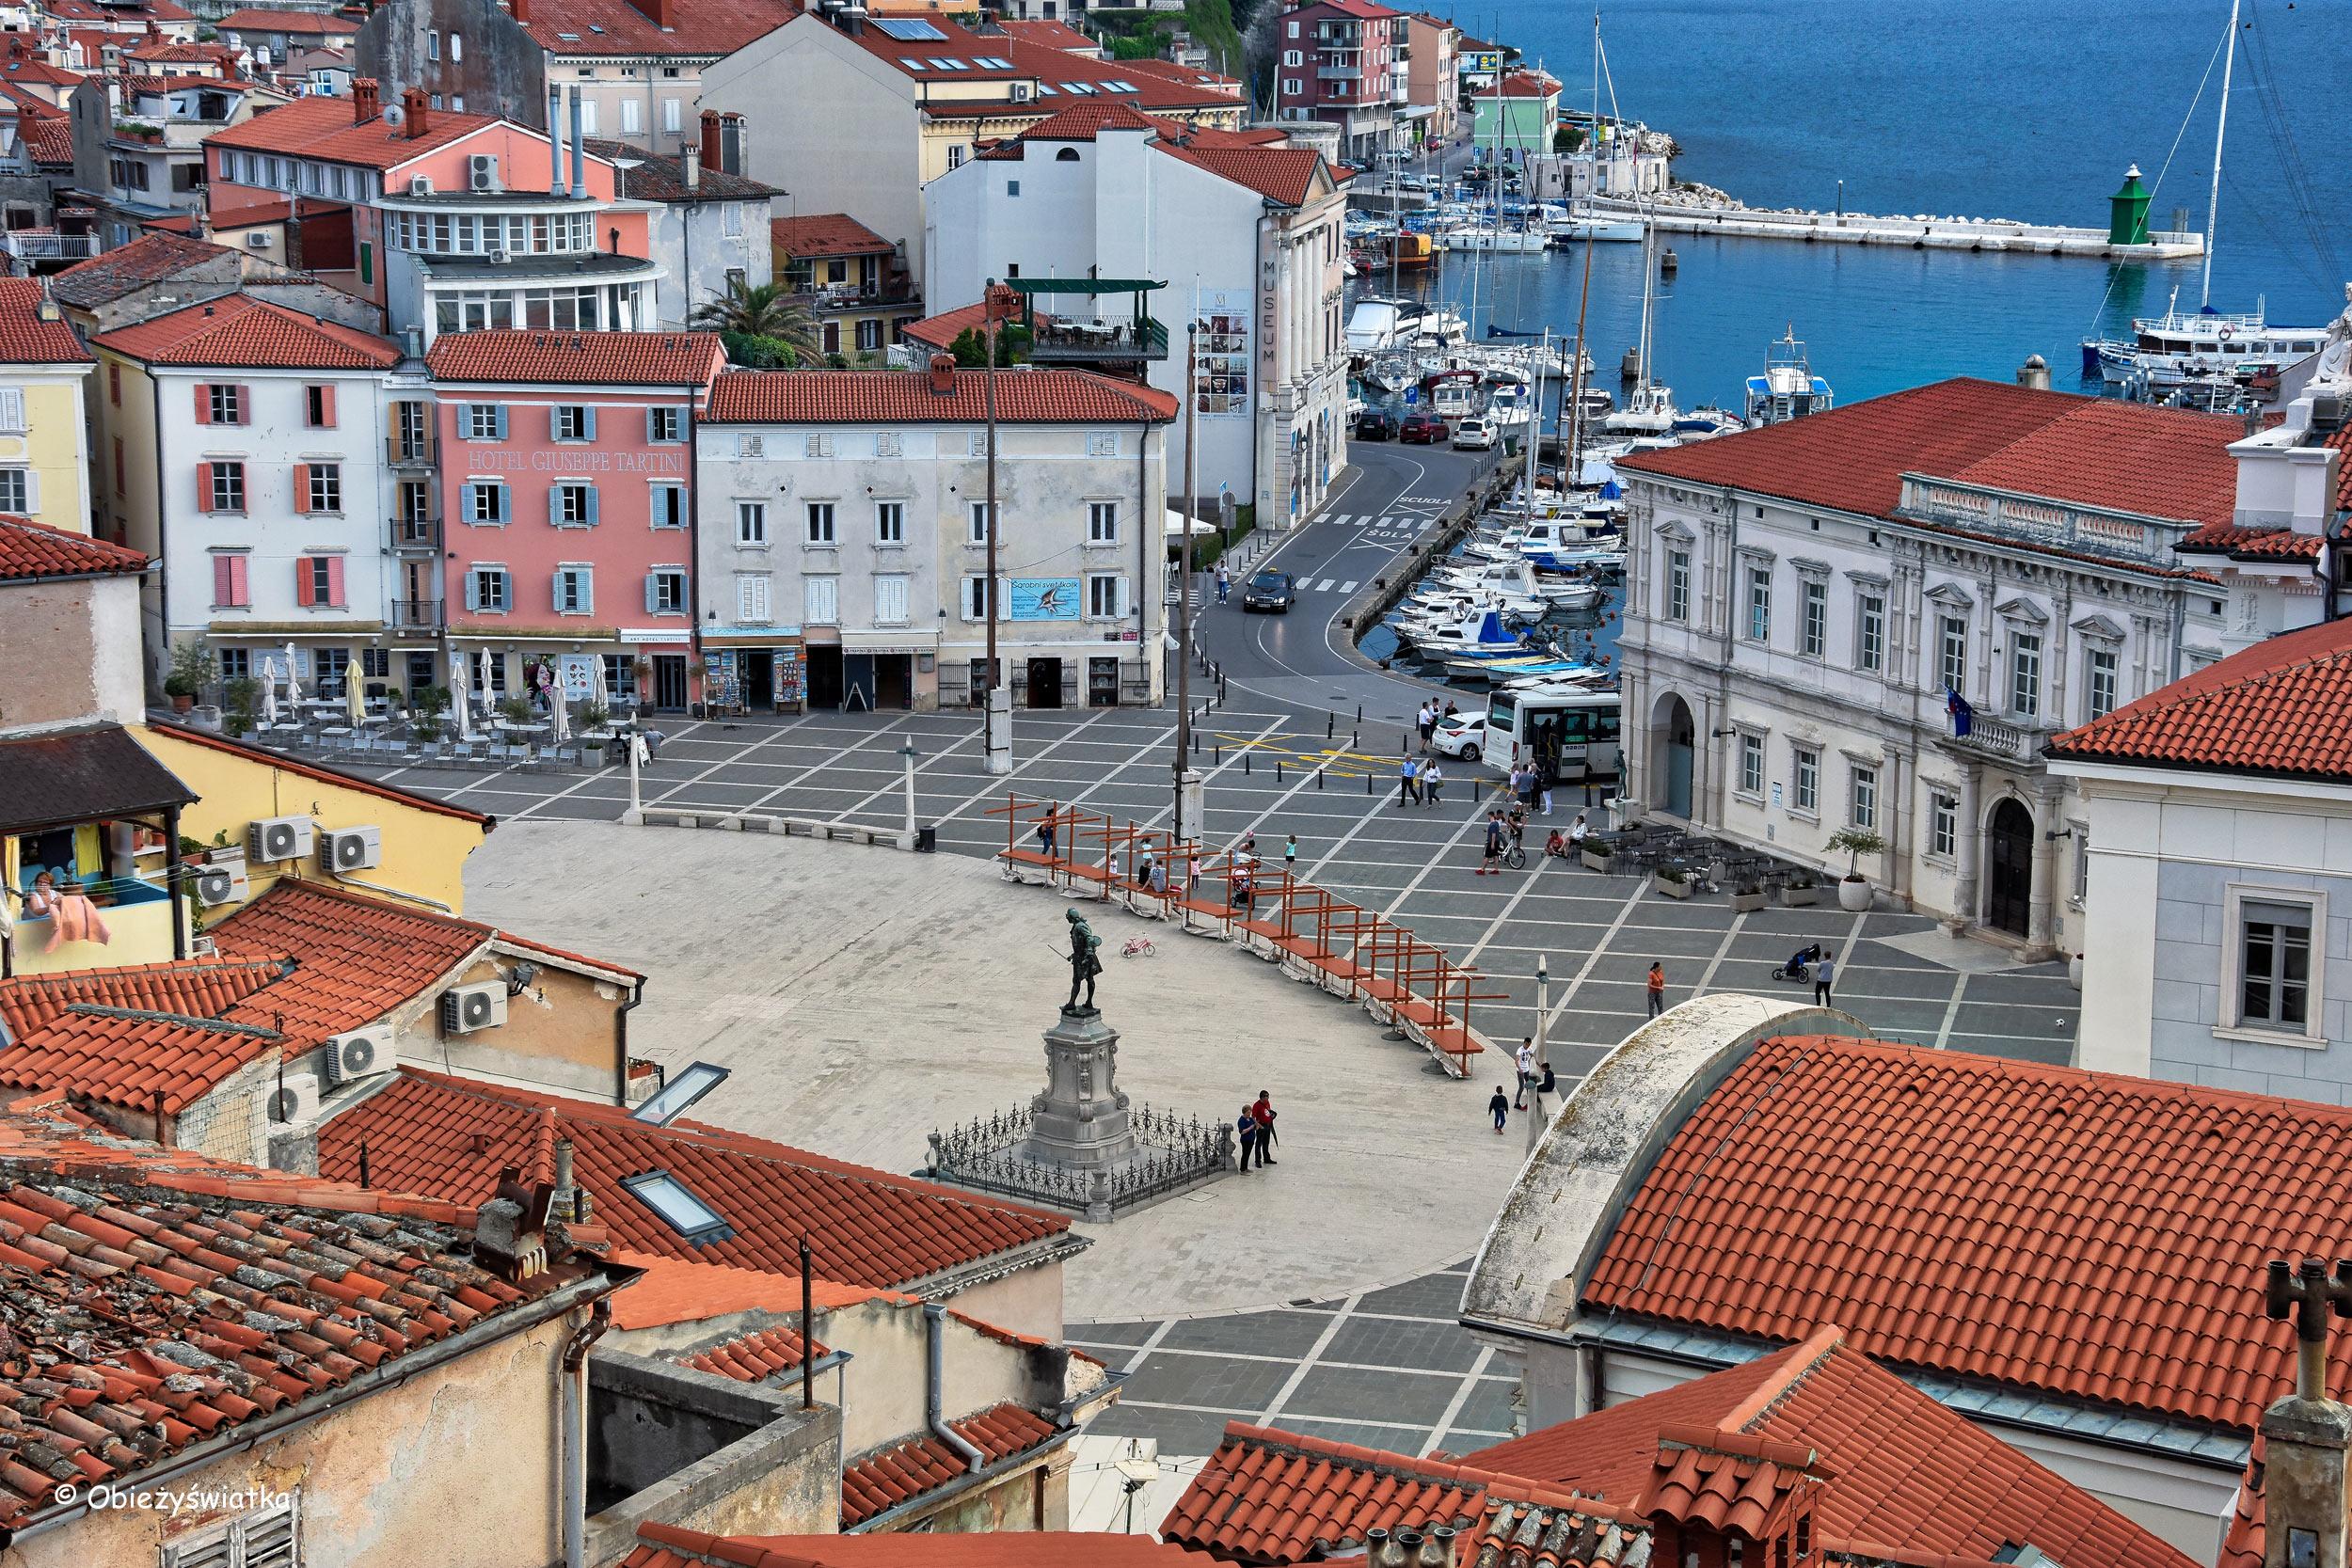 Widok na Piazza Tartini, Piran, Słowenia